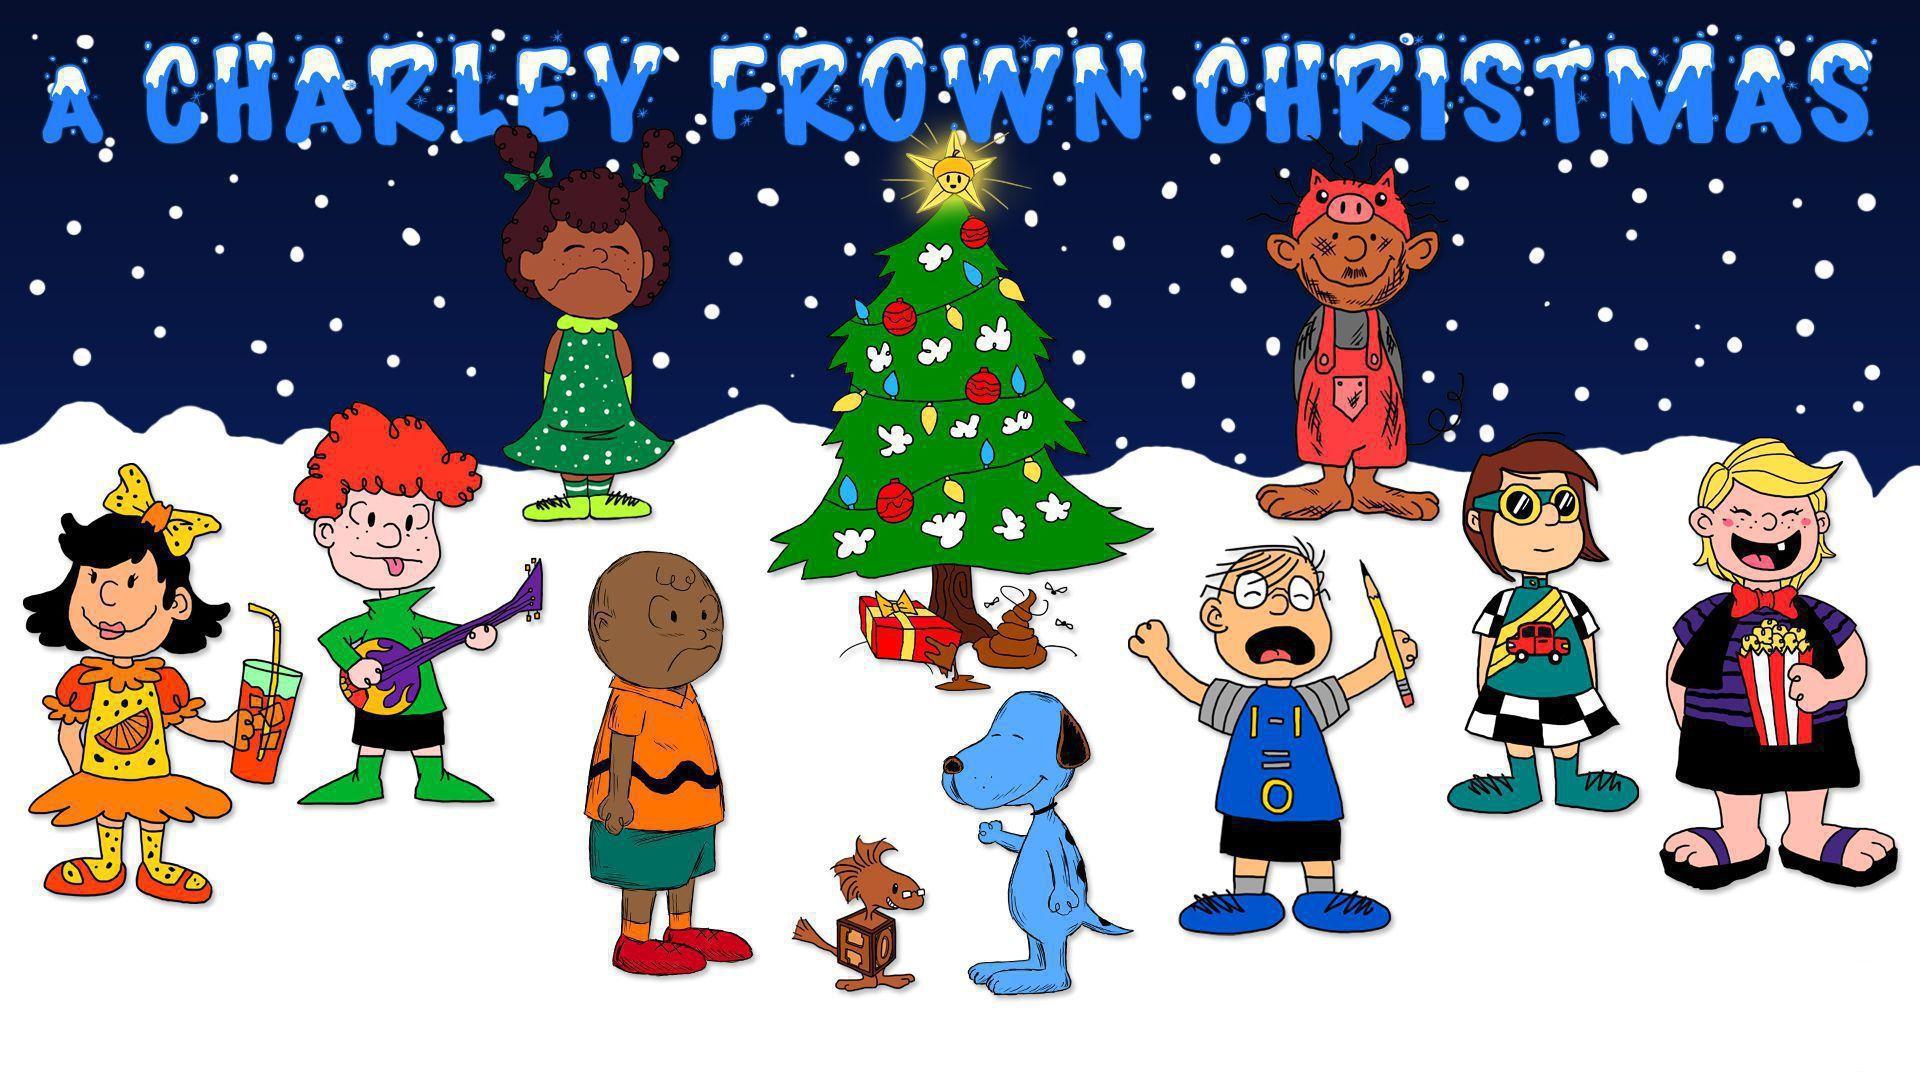 A Charlie Brown Christmas Wallpapers HD